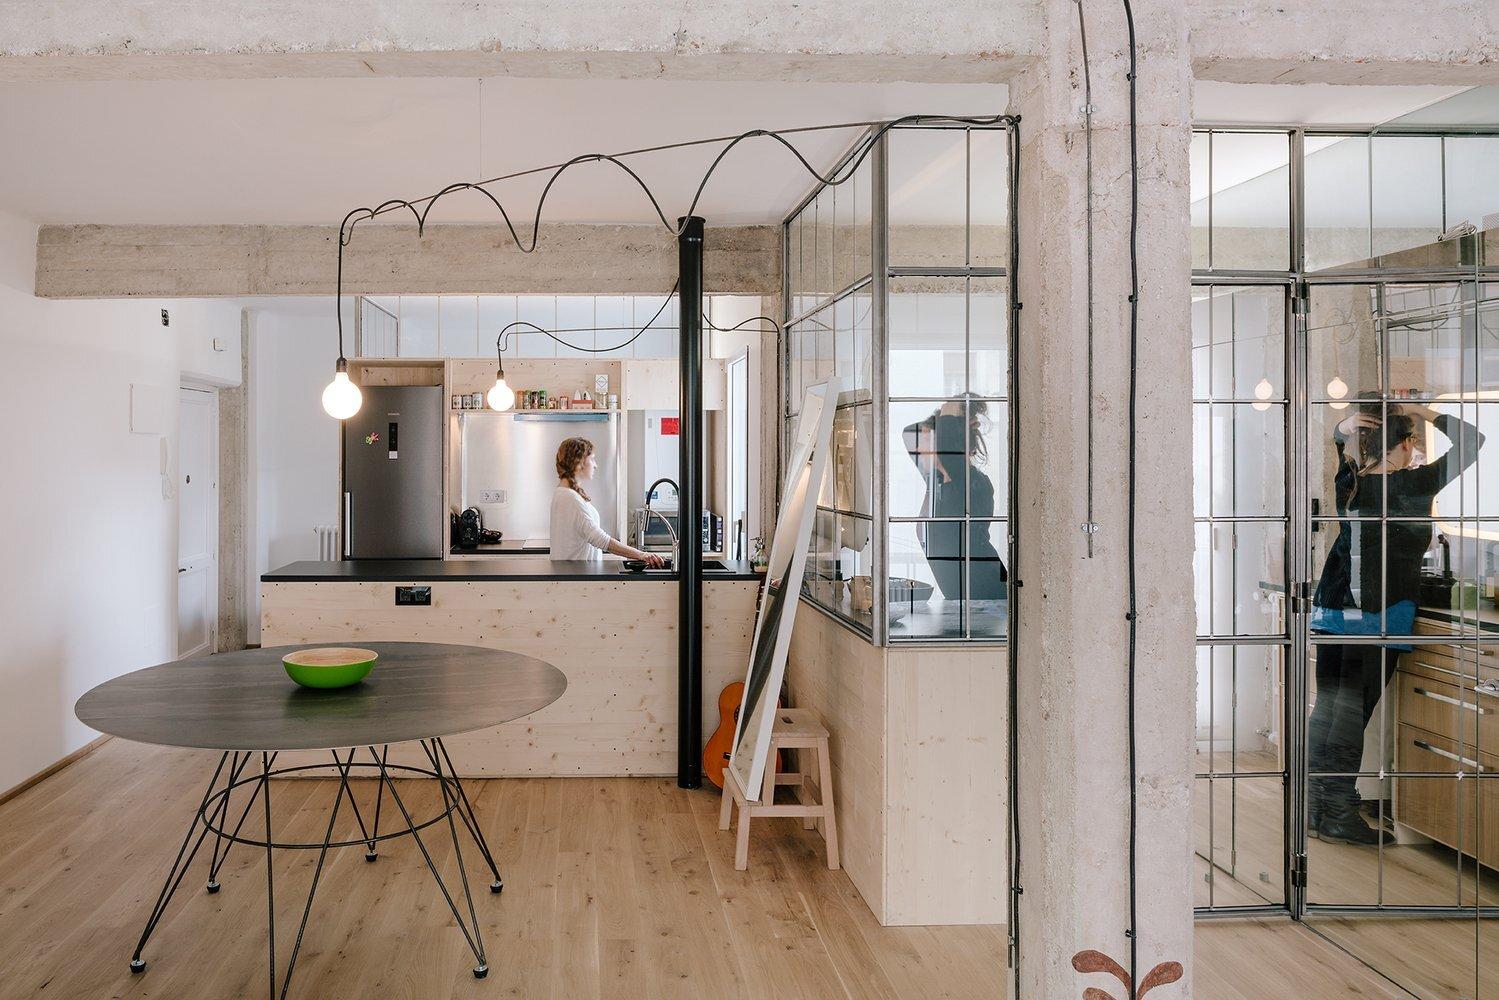 Parais - Manuel Ocaña - Madrid Spain - Kitchen and Dining Area - Humble Homes